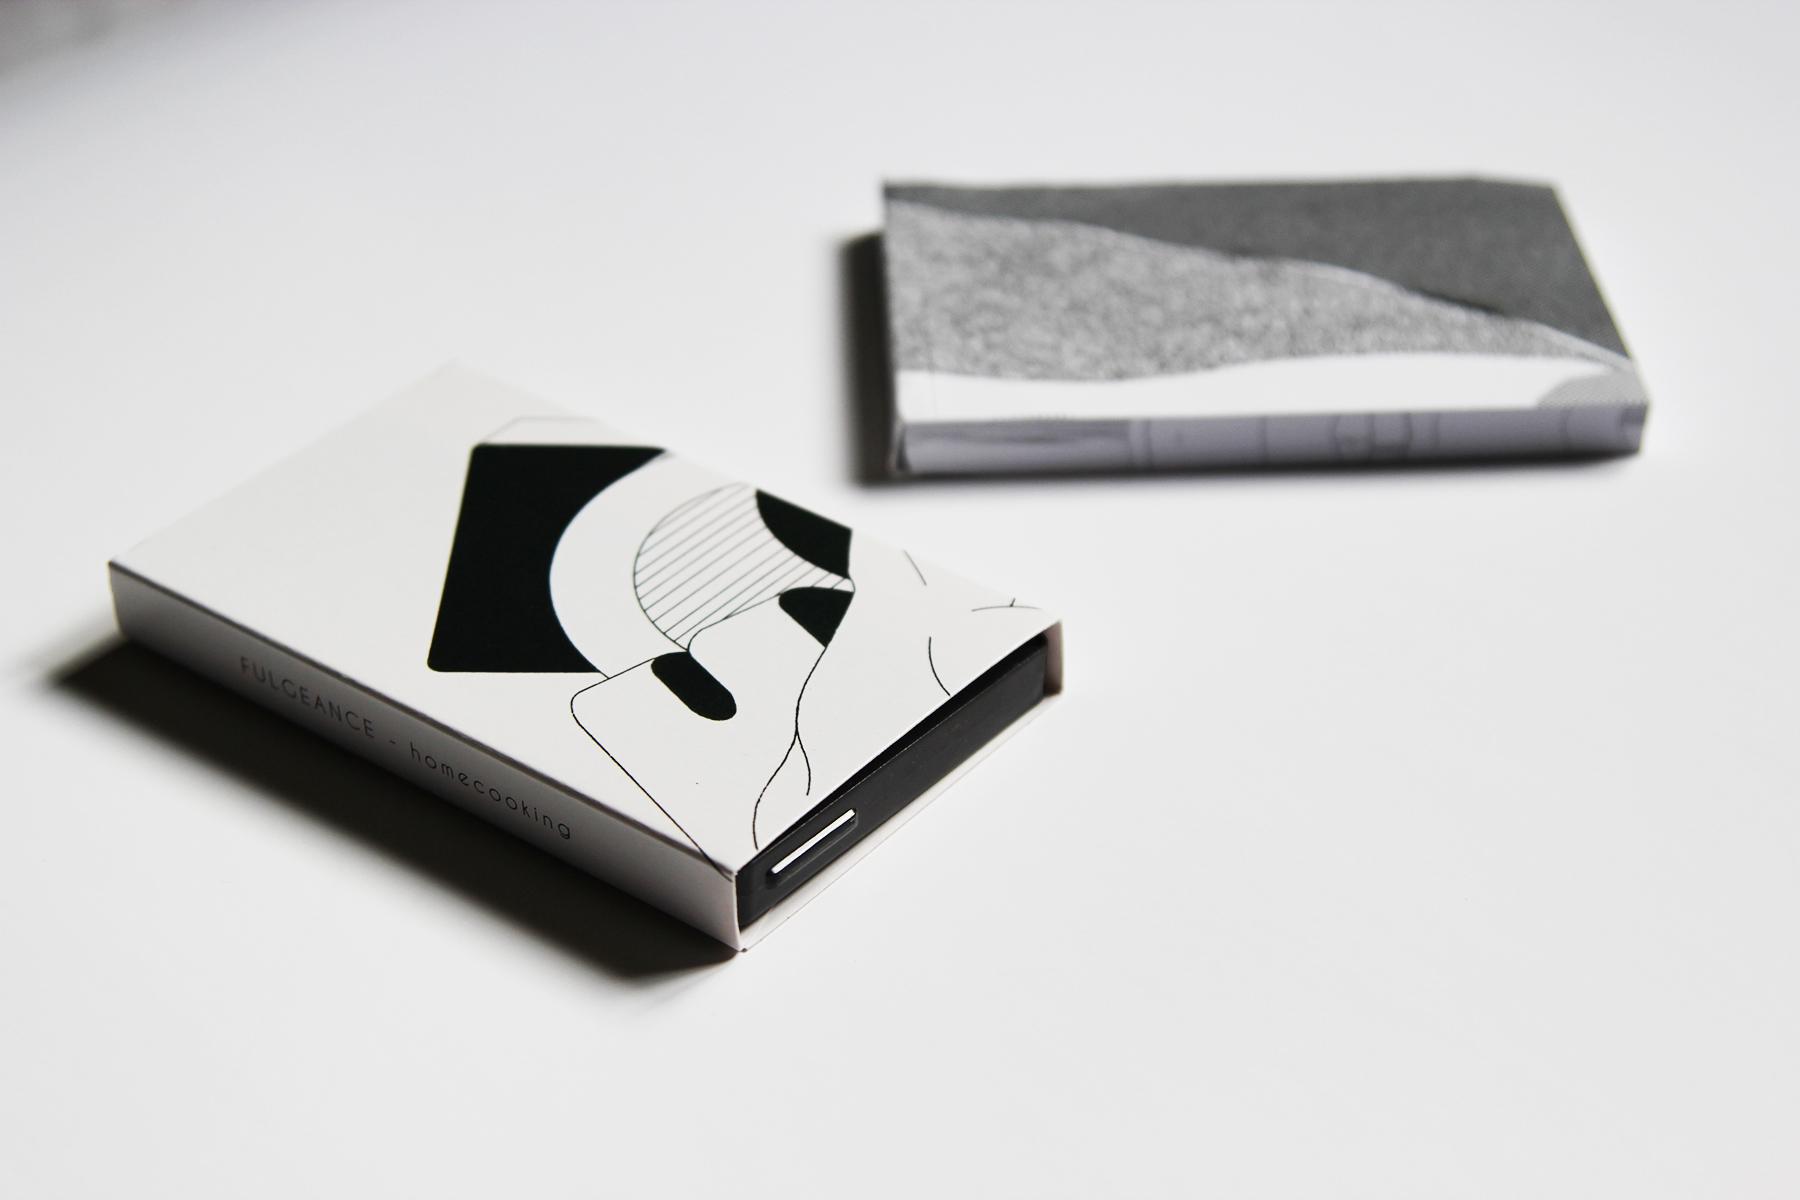 Fulgeance - nouvel album homecooking - electro, electronic music, beats, hip hop, ED Banger box 2